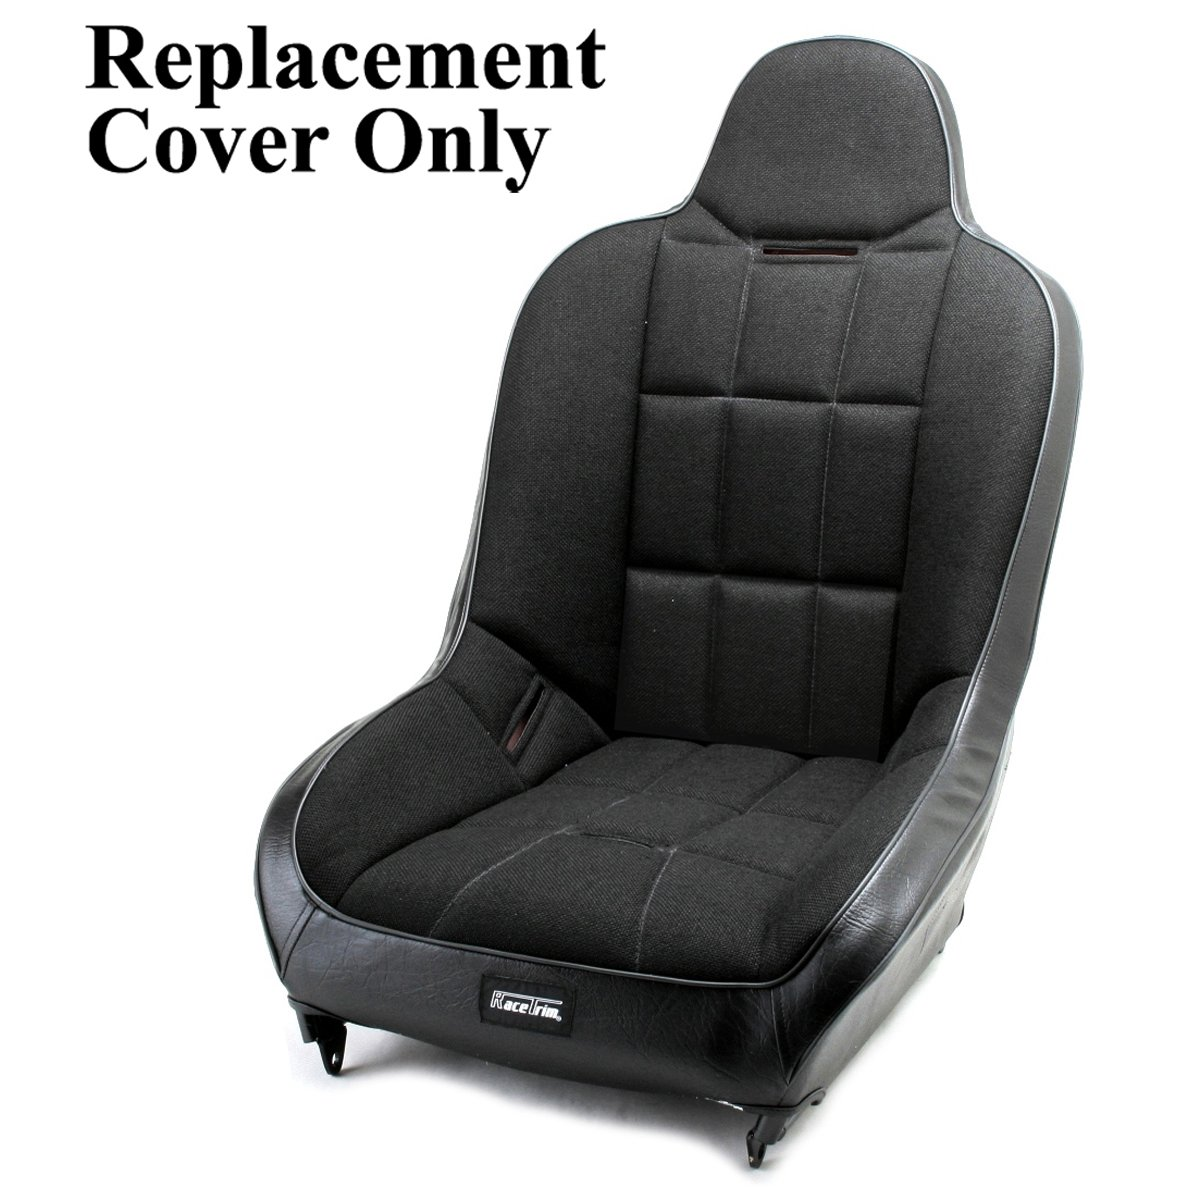 Empi 62-2794-7 Race Trim X-Wide Hi-Back Seat Cover Only Black Cloth//Black Vinyl